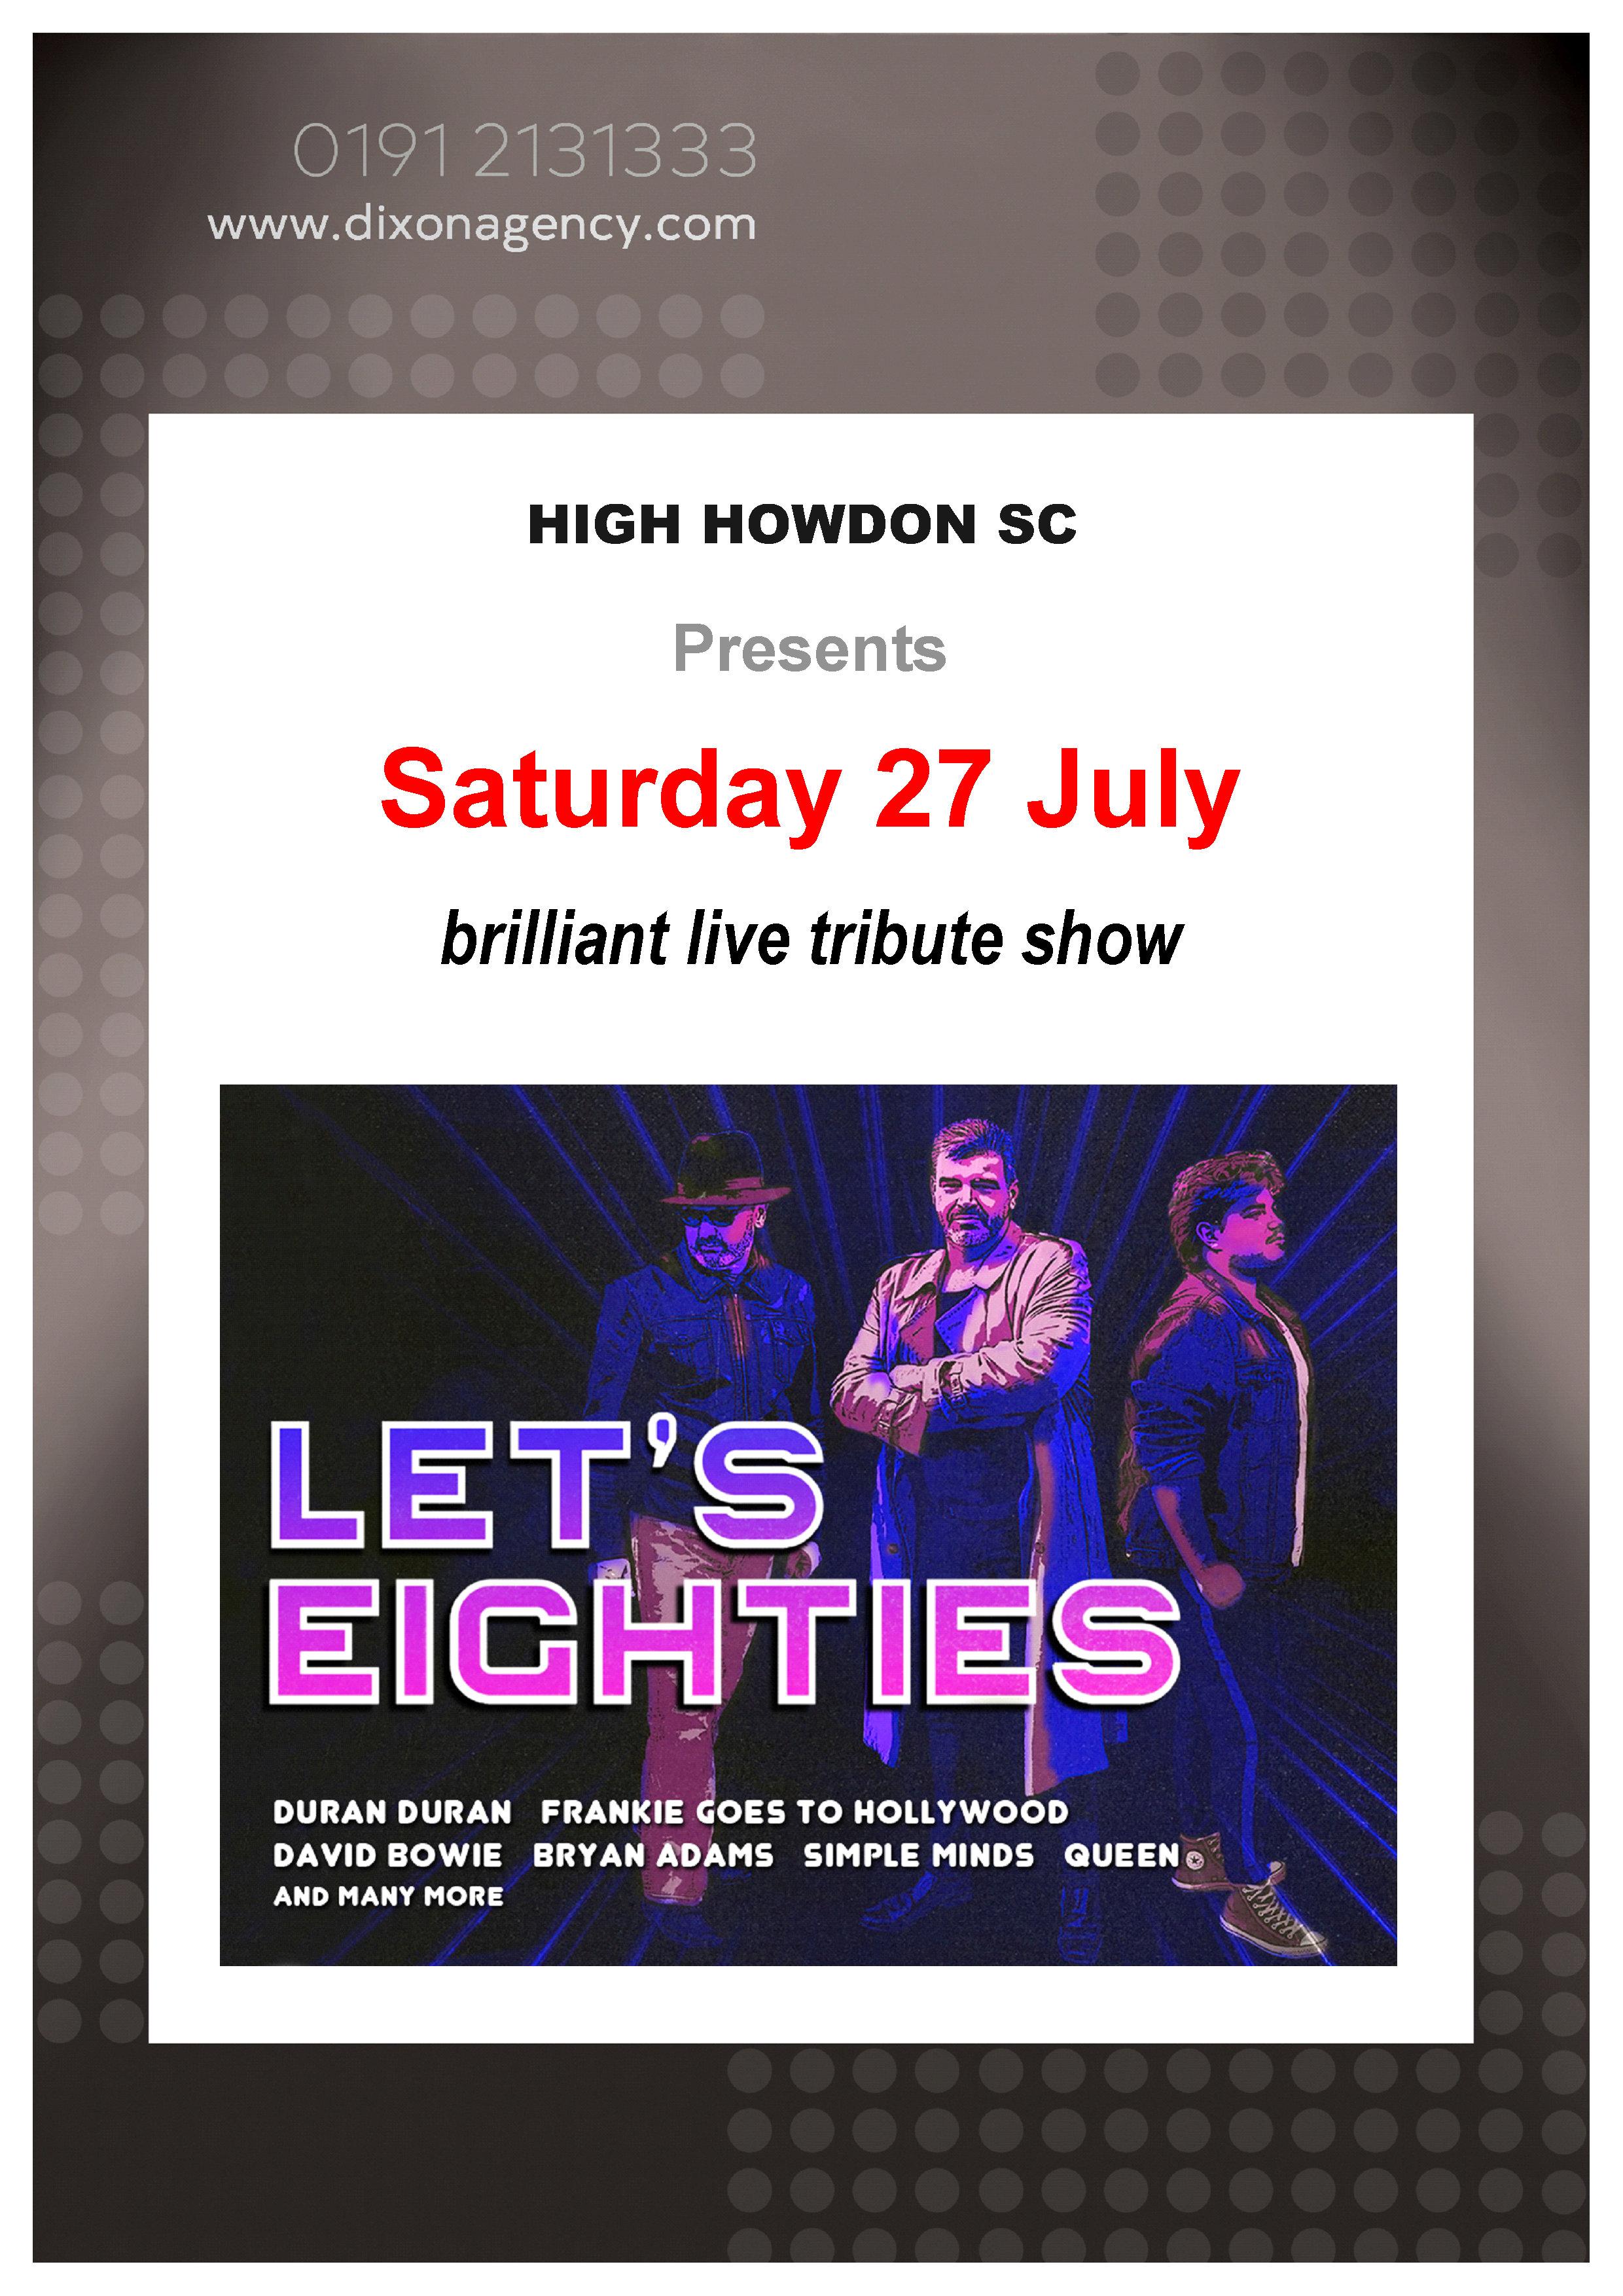 High Howdon Social Club | Lets Eighties